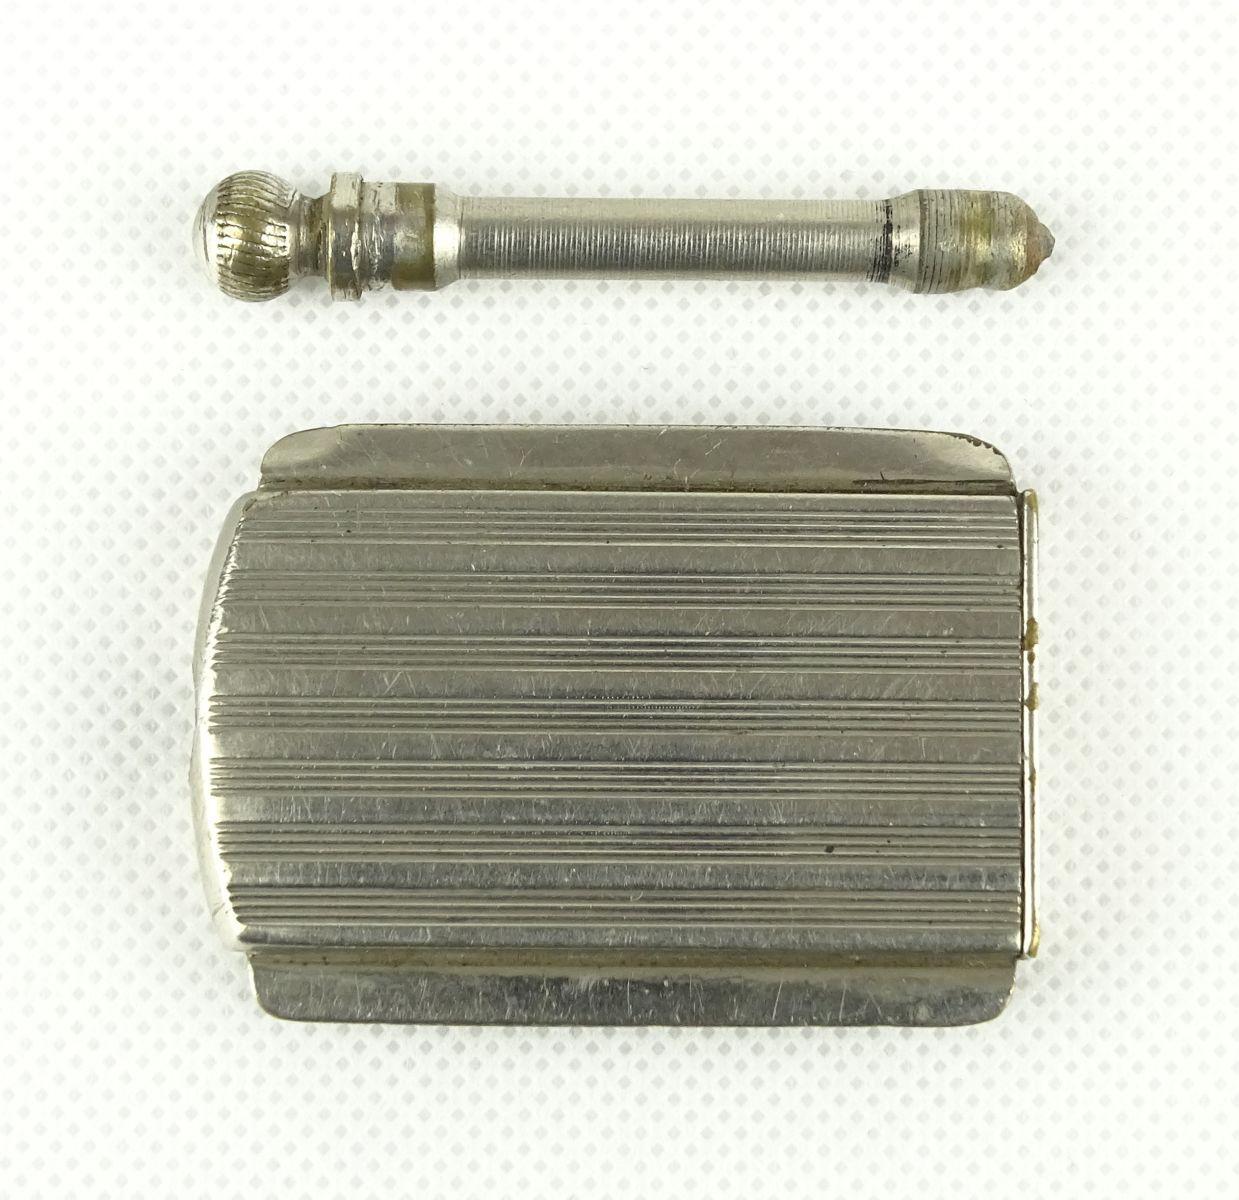 DSC00806.JPG (1239×1200)